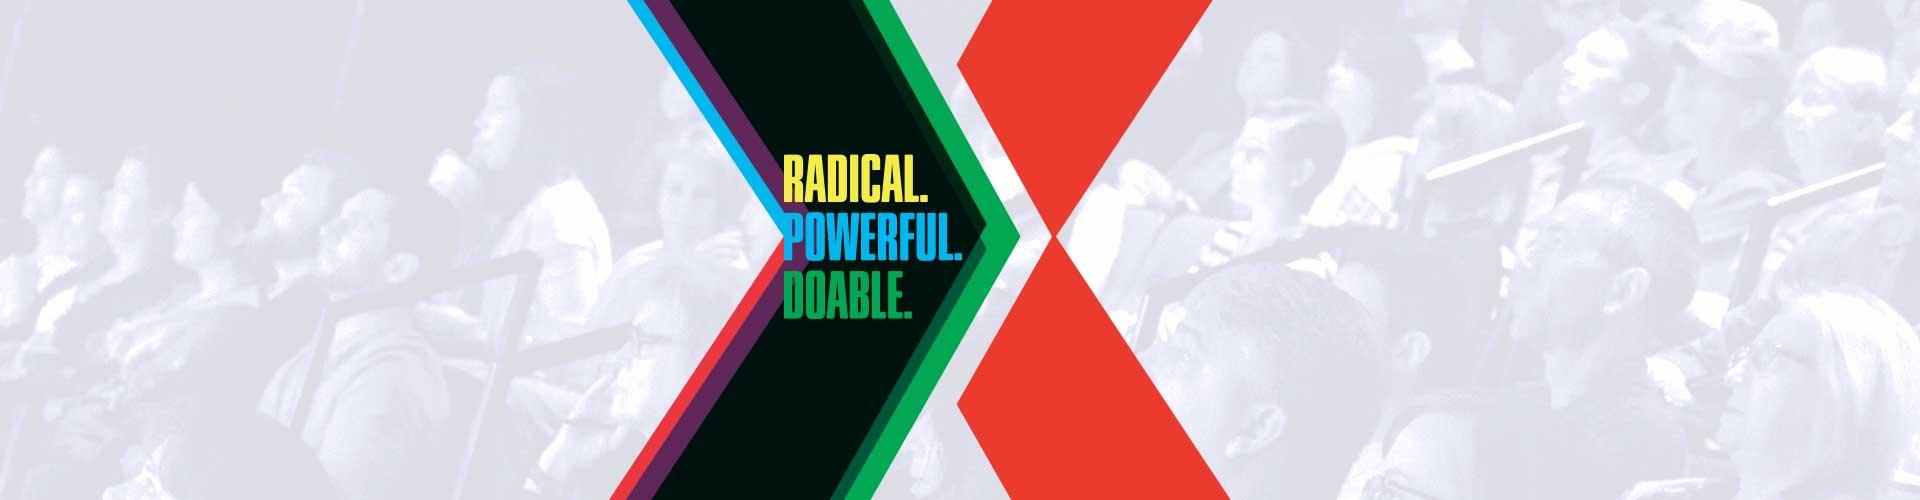 TEDxGreensboro 2016 Radical. Powerful. Doable.